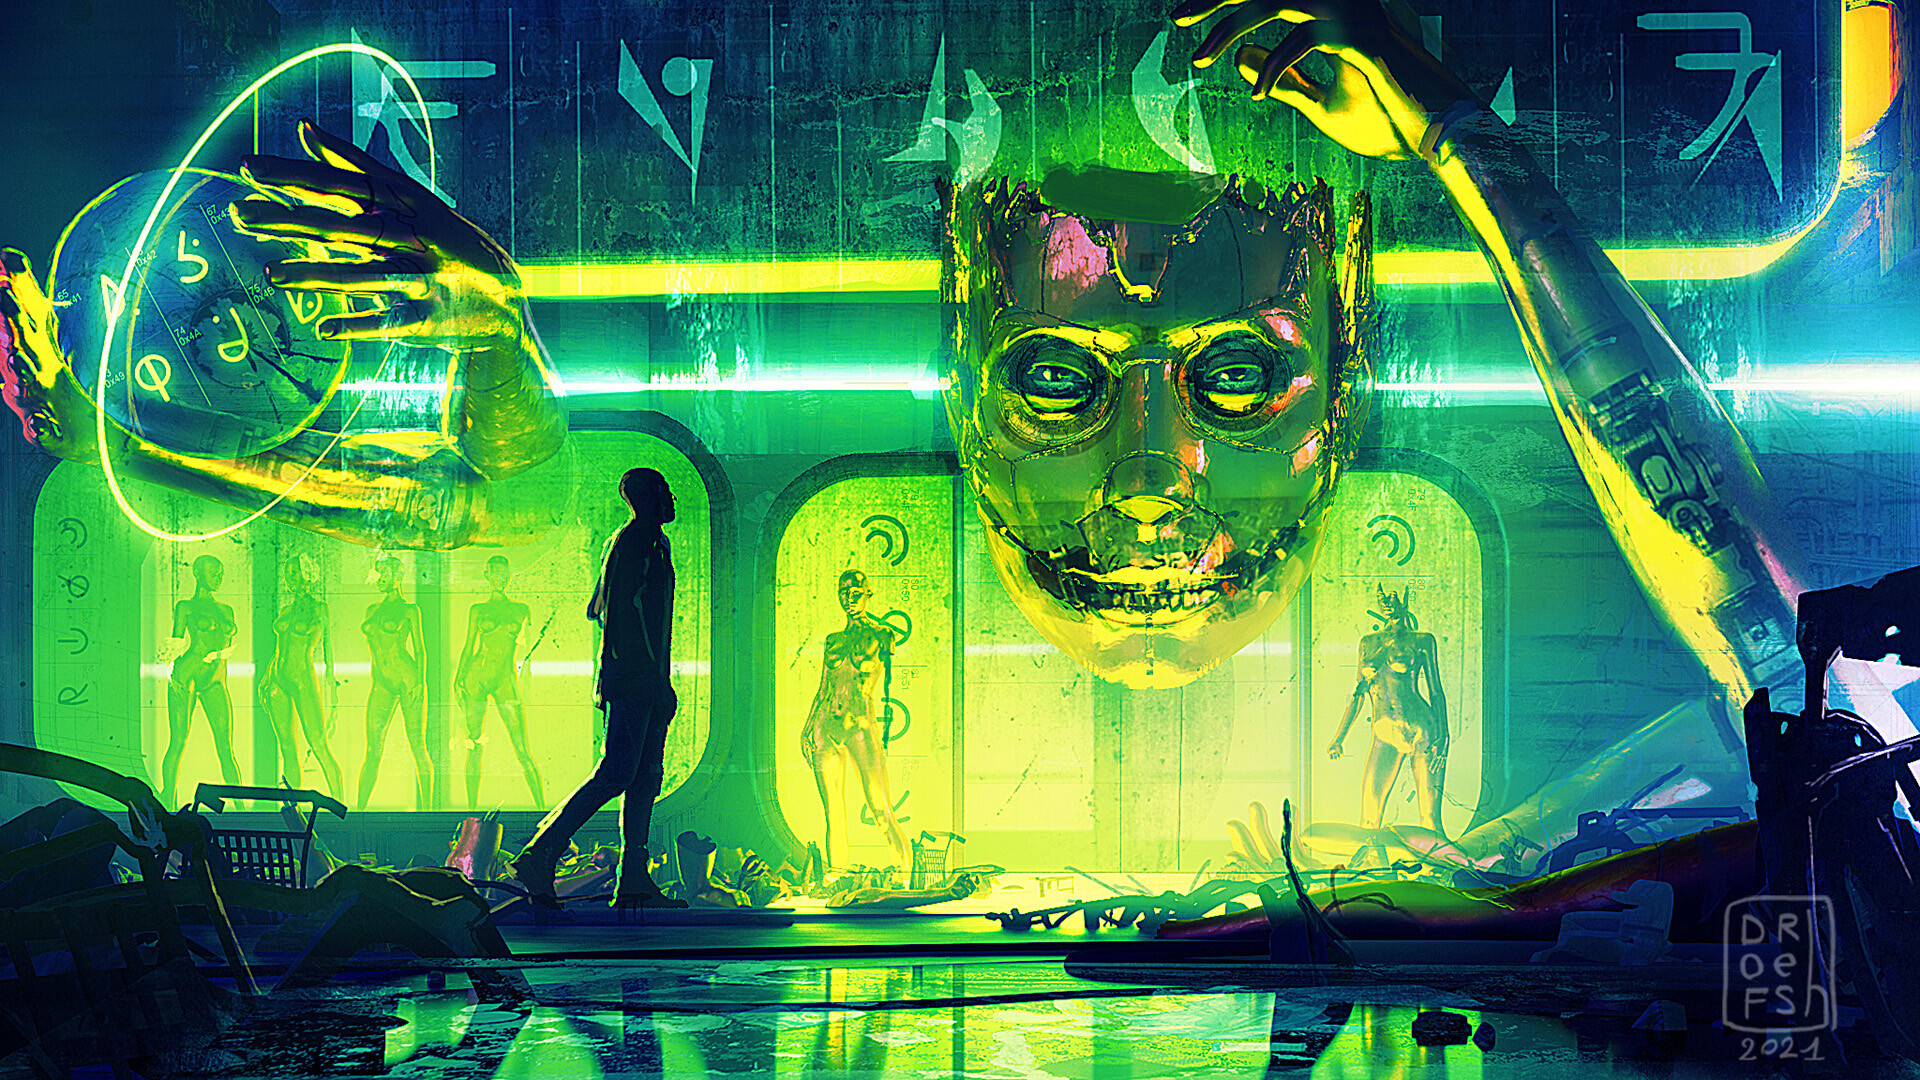 General 1920x1080 artwork science fiction cyberpunk